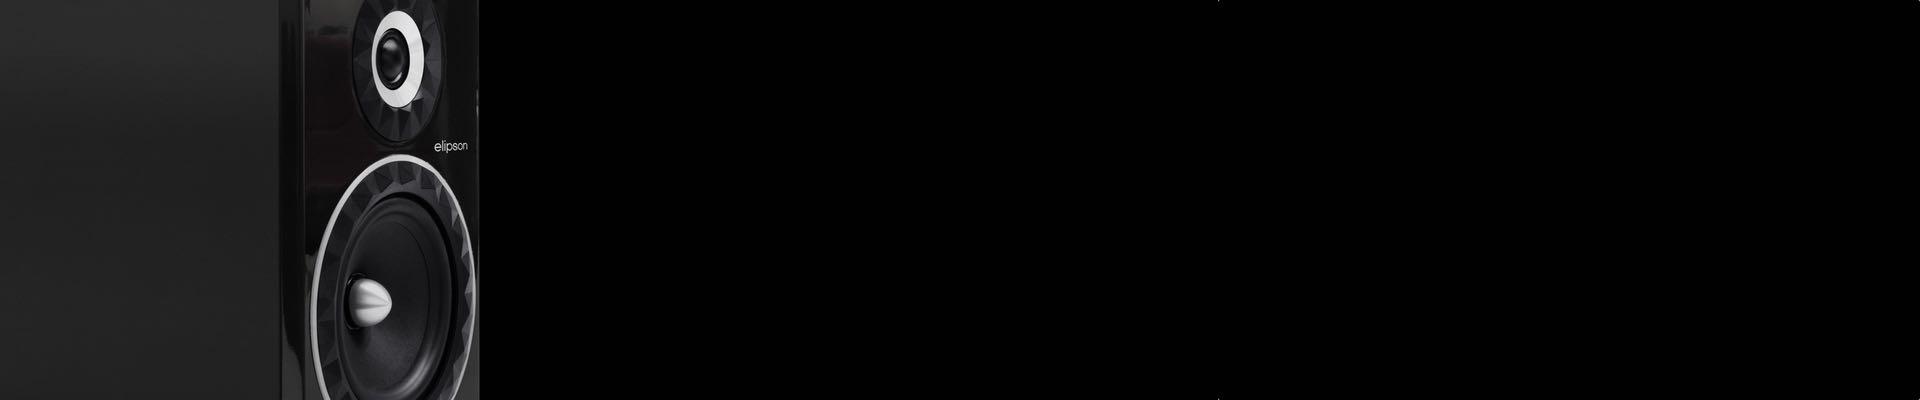 sl-multizone-elipson-201710